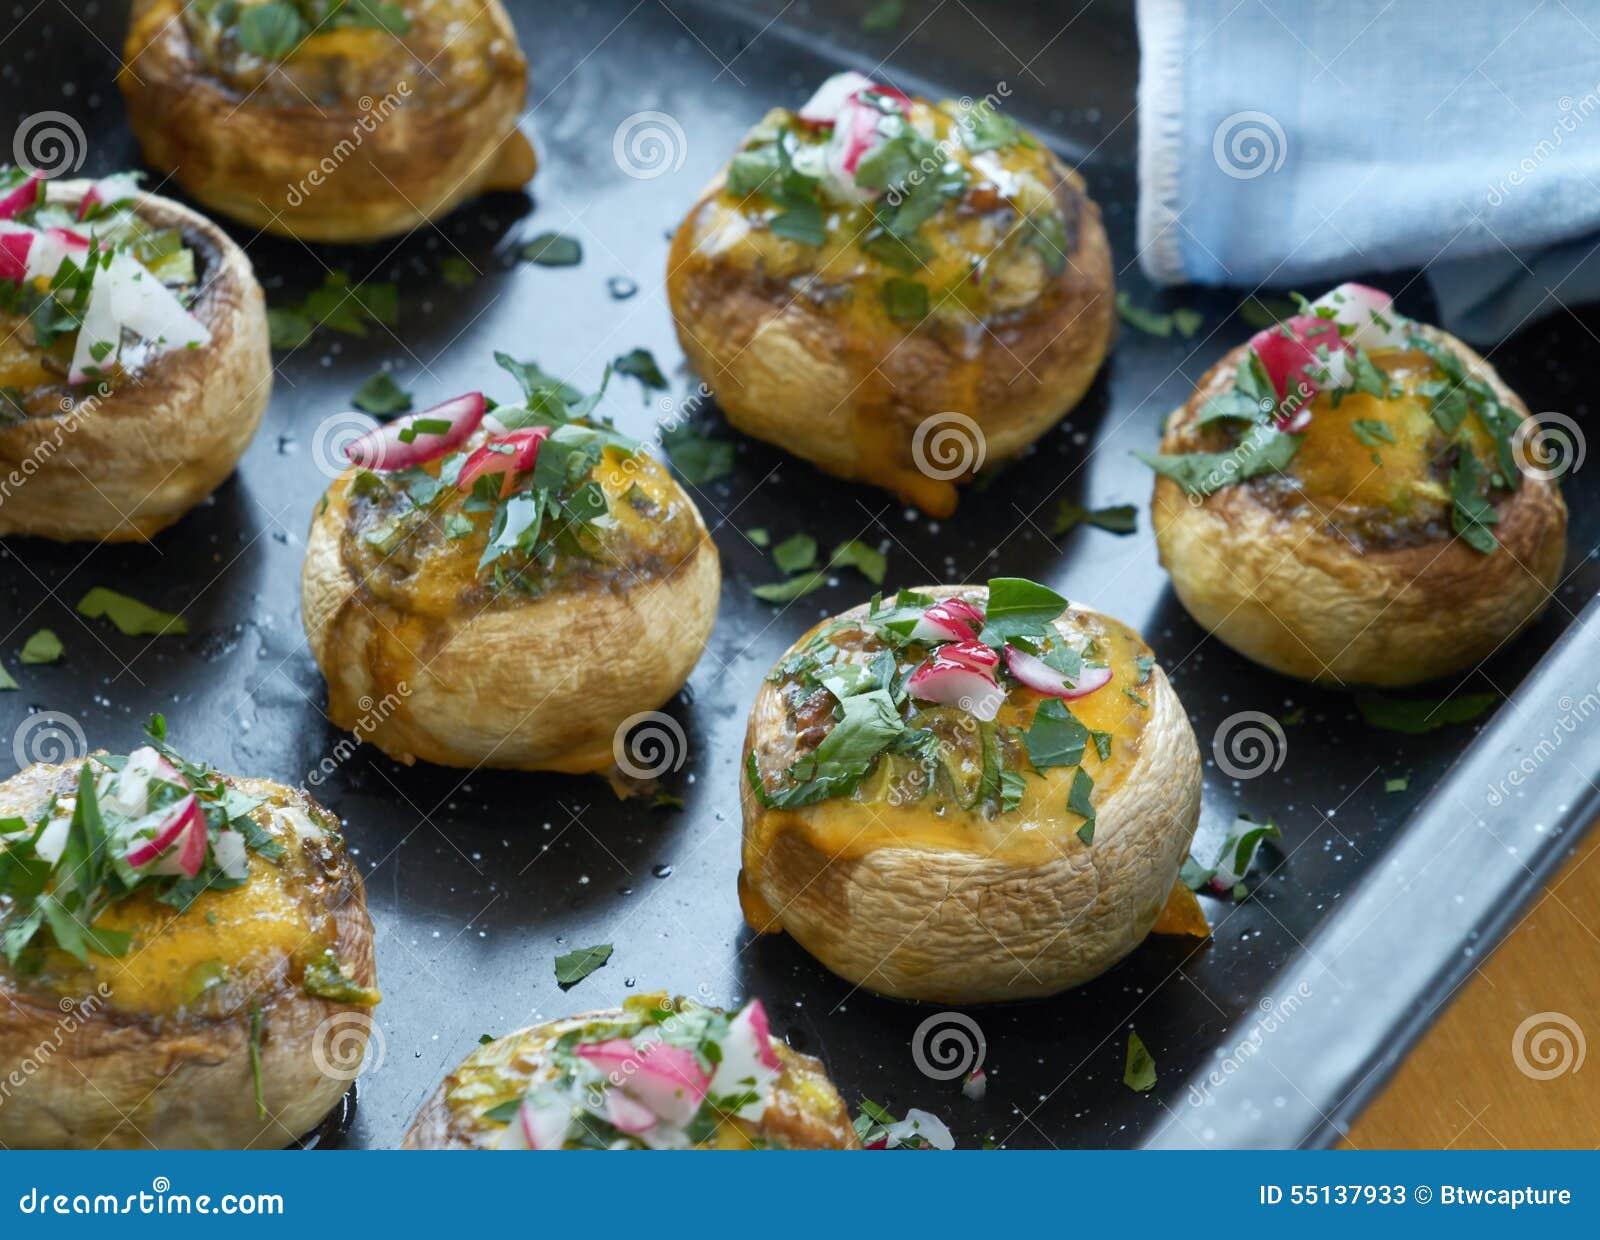 Stuffed Mushrooms Stock Photo - Image: 55137933